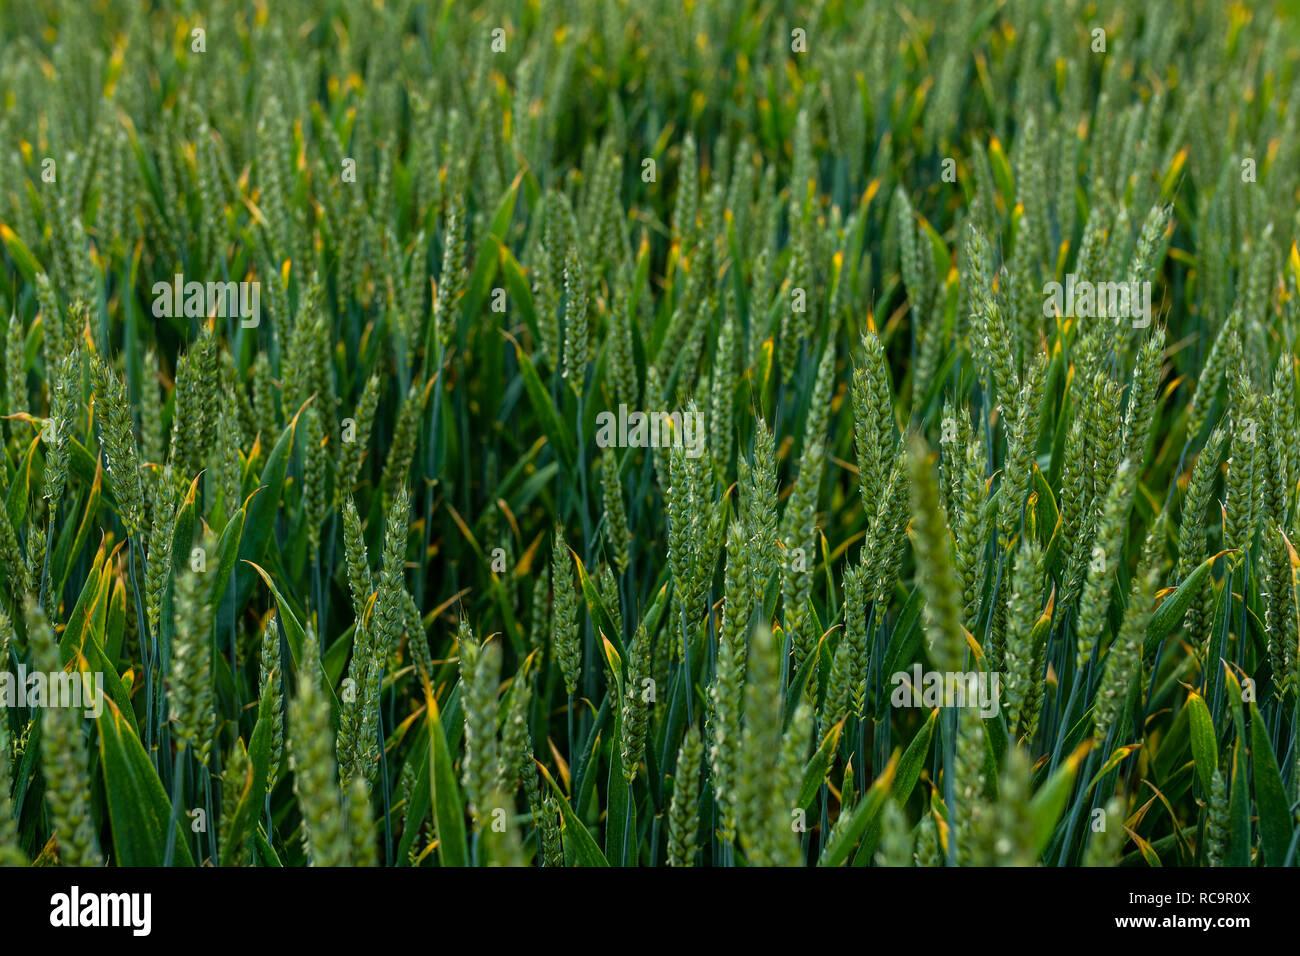 Field of Fresh Green Corn Grain Growing with depth of field - Stock Image